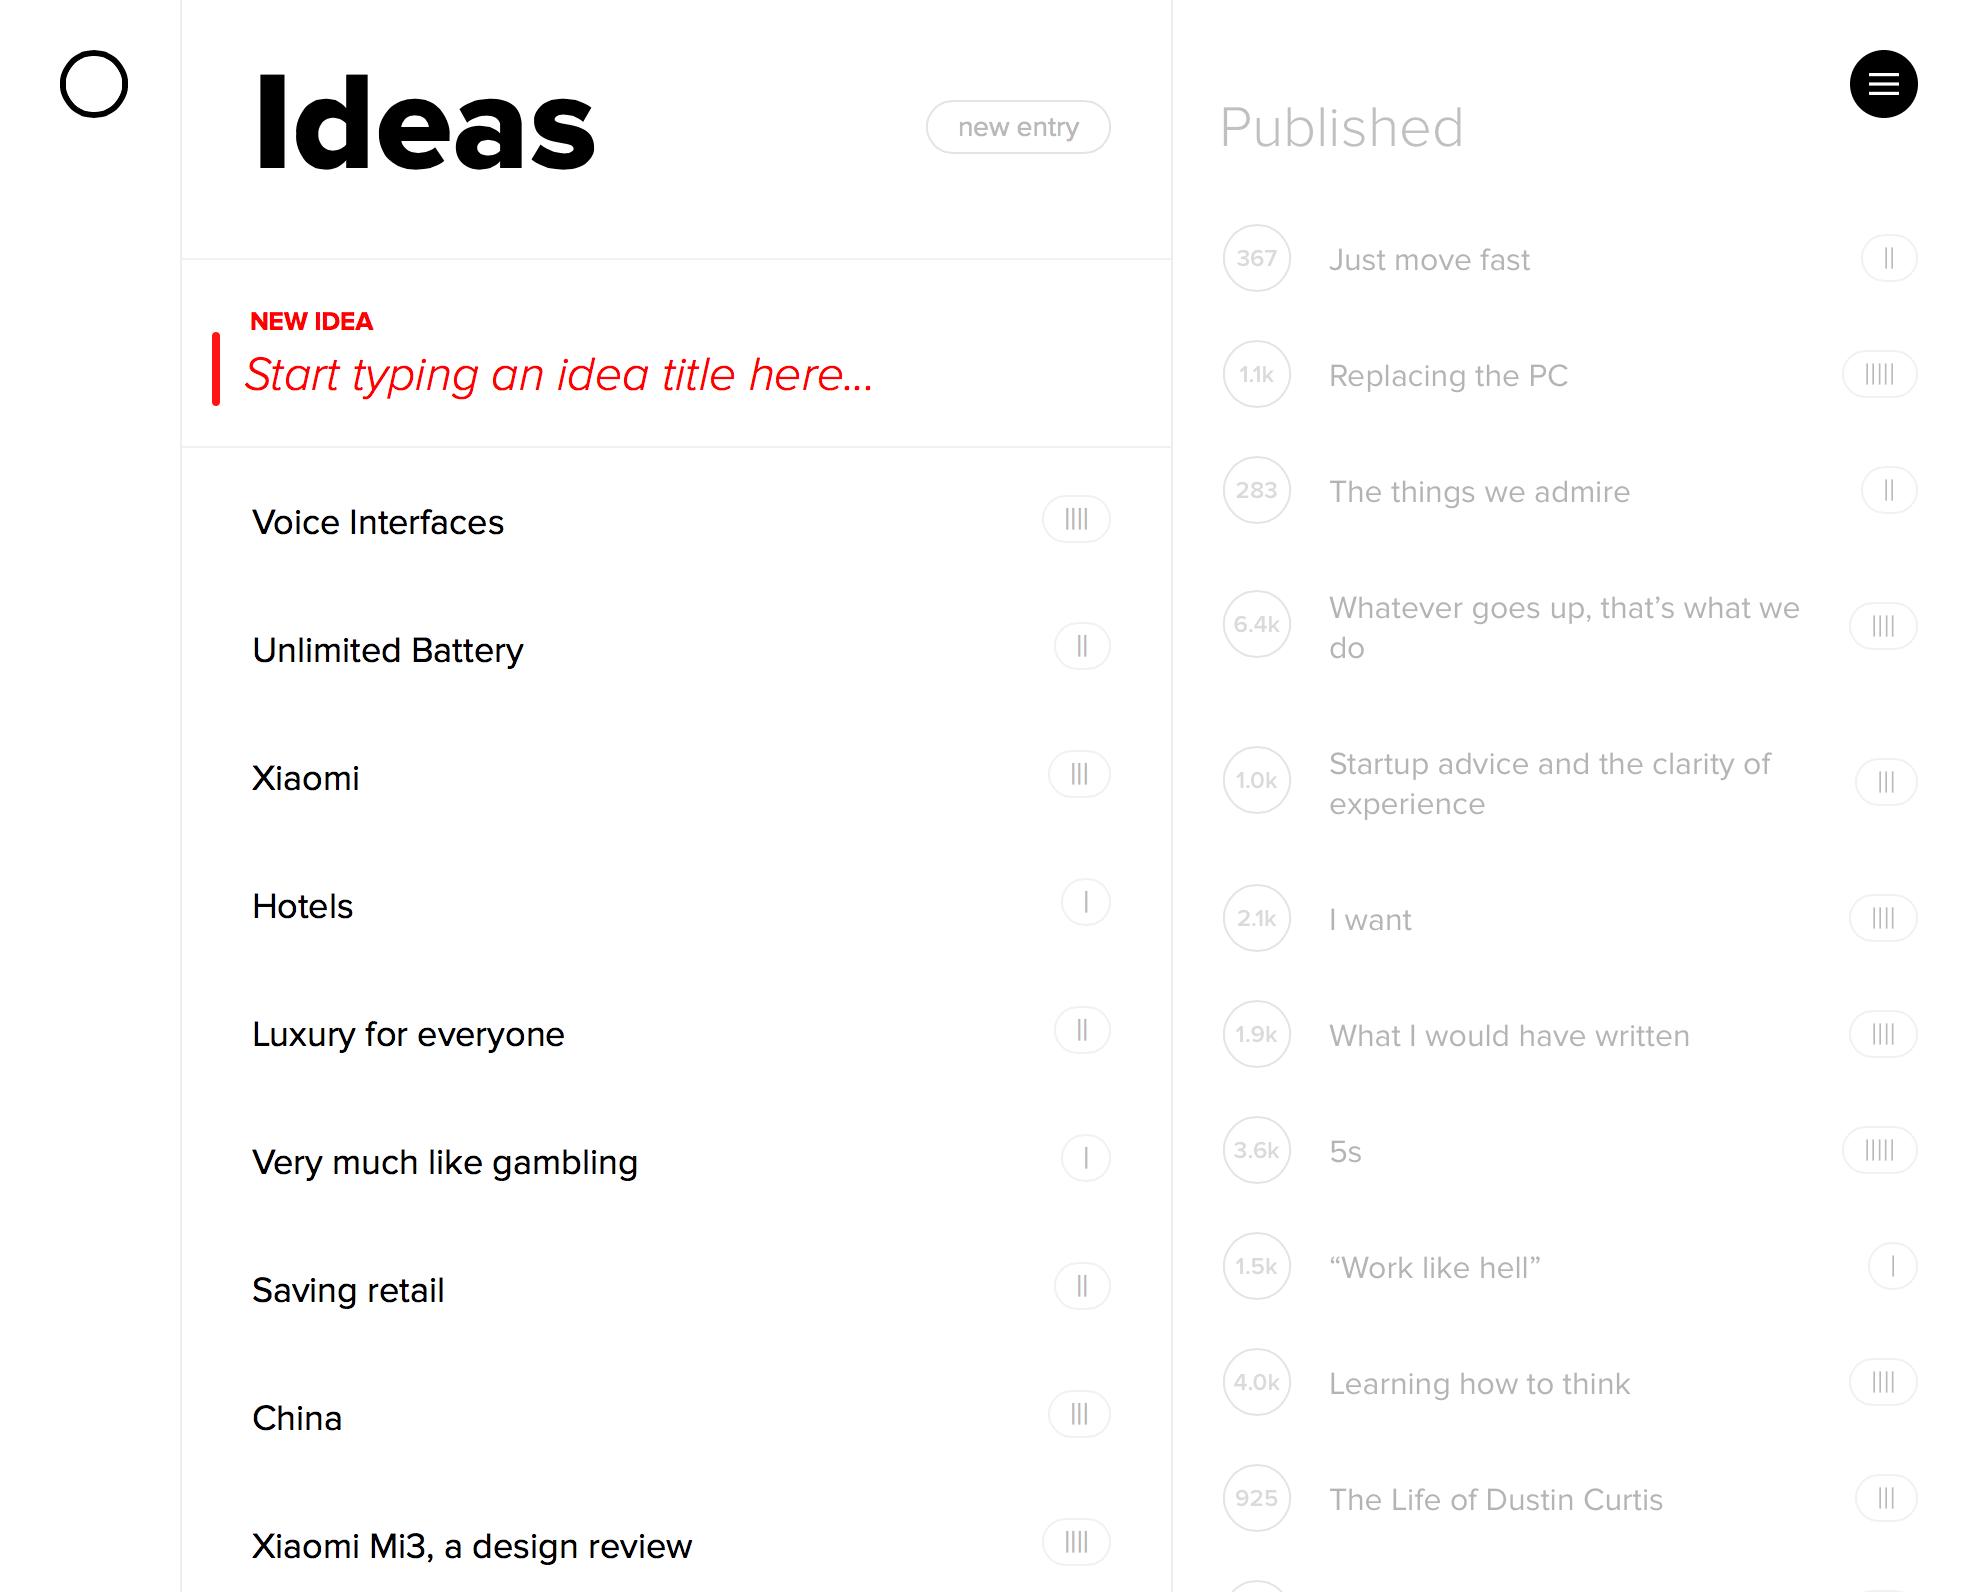 user experience essay ideas